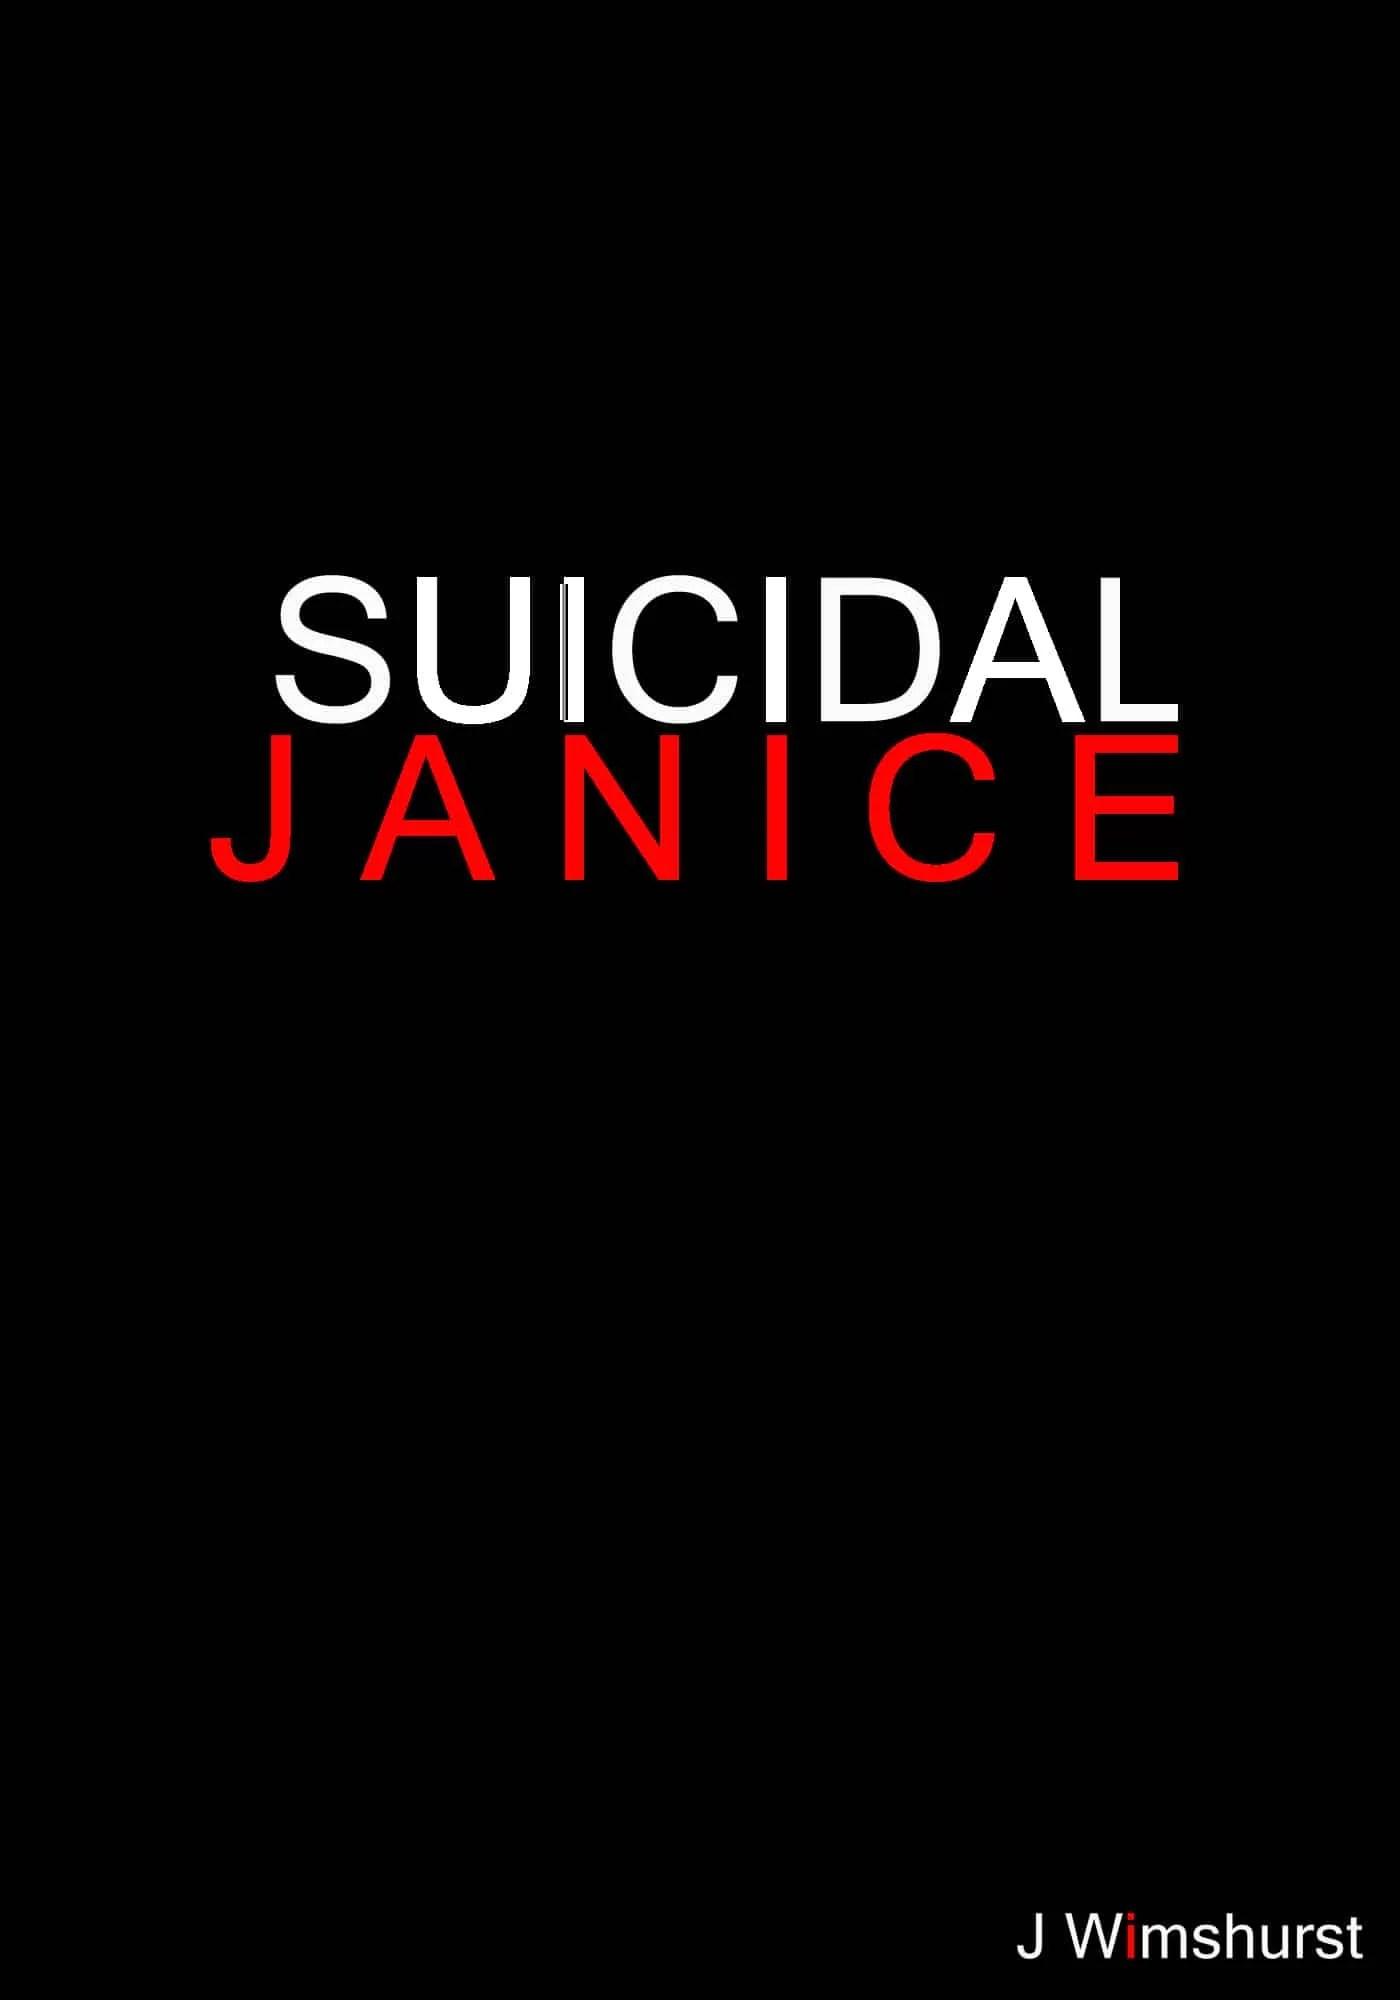 Suicidal Janice comedy short